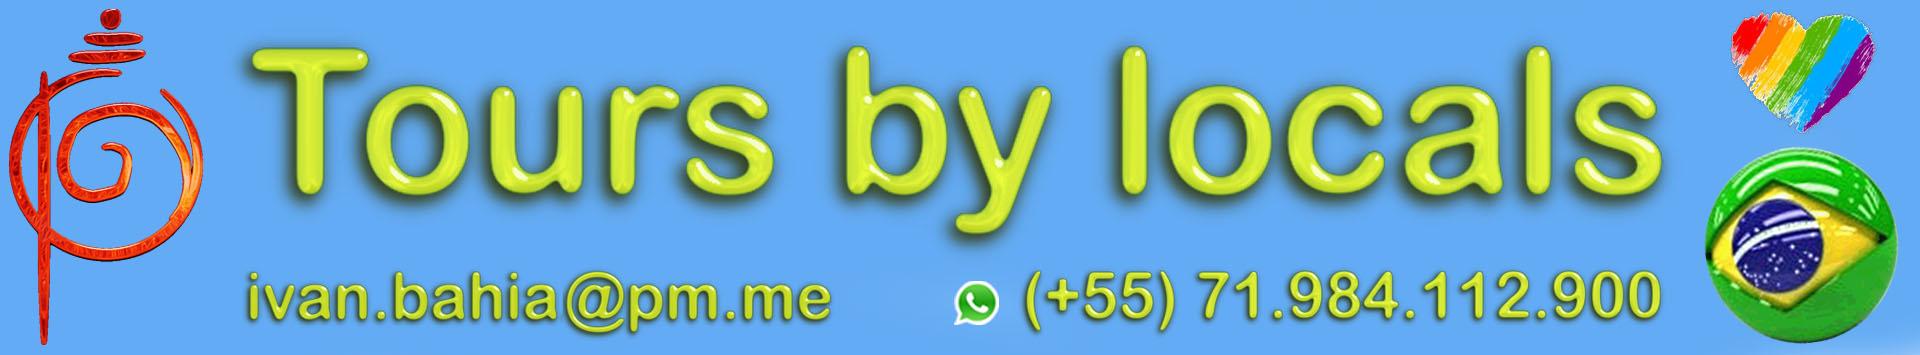 logo Tours by Locals, discover Bahia with Ivan Bahia, travel agency in Salvador da Bahia, the original Capital of Brazil with TOP private tours & guides, your best experience (in English - Français - Nederlands) in Bahia, Chapada Diamantina National Park, All Saints Bay, Cachoeira, Recôncavo Baiano, Praia do Forte, Coconut coast and Bahia / NE-Brazil #ivanbahiaguide #ivansalvadorbahia #salvadorbahiabrazil #bahiatourism #fotoschapadadiamantina #ibg #ibtg #fotosbahia #salvadorbahiatravel #toursbylocals #ivanbahia #ibg #ibtg #chapadadiamantinatransfer #chapadadiamantina #chapadaexperience #lencoistomorrodesaopaulo #voyagebresil #bresilessentiel #salvadortourguide #chapadadiamantinatrekking #lencois #lençois #toursbahia #brazilhoneymoon #yourtourbrazil #yourtoursbrazil #ig_bahia #bahiatours #reconcavobaiano #bahiaguide  #citytoursalvador #bahiametisse #guidedetourismesalvadorbahiabresil #transatjacquesvabres #sailingbrazil #yourtoursbrazil #maurotours #bahiatopturismo #gaytravelbrazil  #transfersalvador #morrodopaiinacio #FotosChapadaDiamantina #BahiaTourism #SalvadorBahiaBrazil #lgbtqfriendly #SalvadorBahiaTravel #tripadvisorsalvador #tripadvisorbahia #gaystraveltoo #toursbahia #bahiatravel #salvadortourguide #travelaftercovid19 #ssalovers